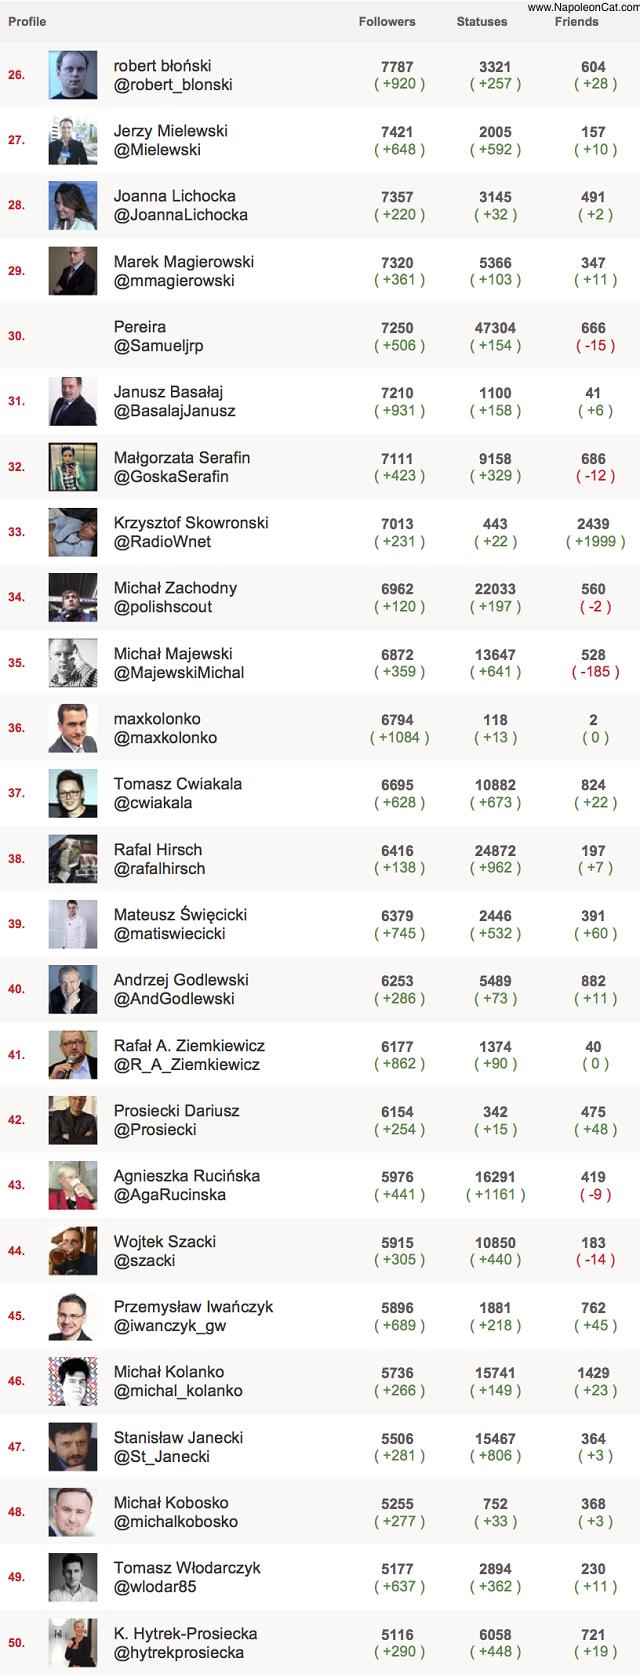 http://static.wirtualnemedia.pl/media/images/2013/images/dziennikarzepolscy_top150_Twitter2.png